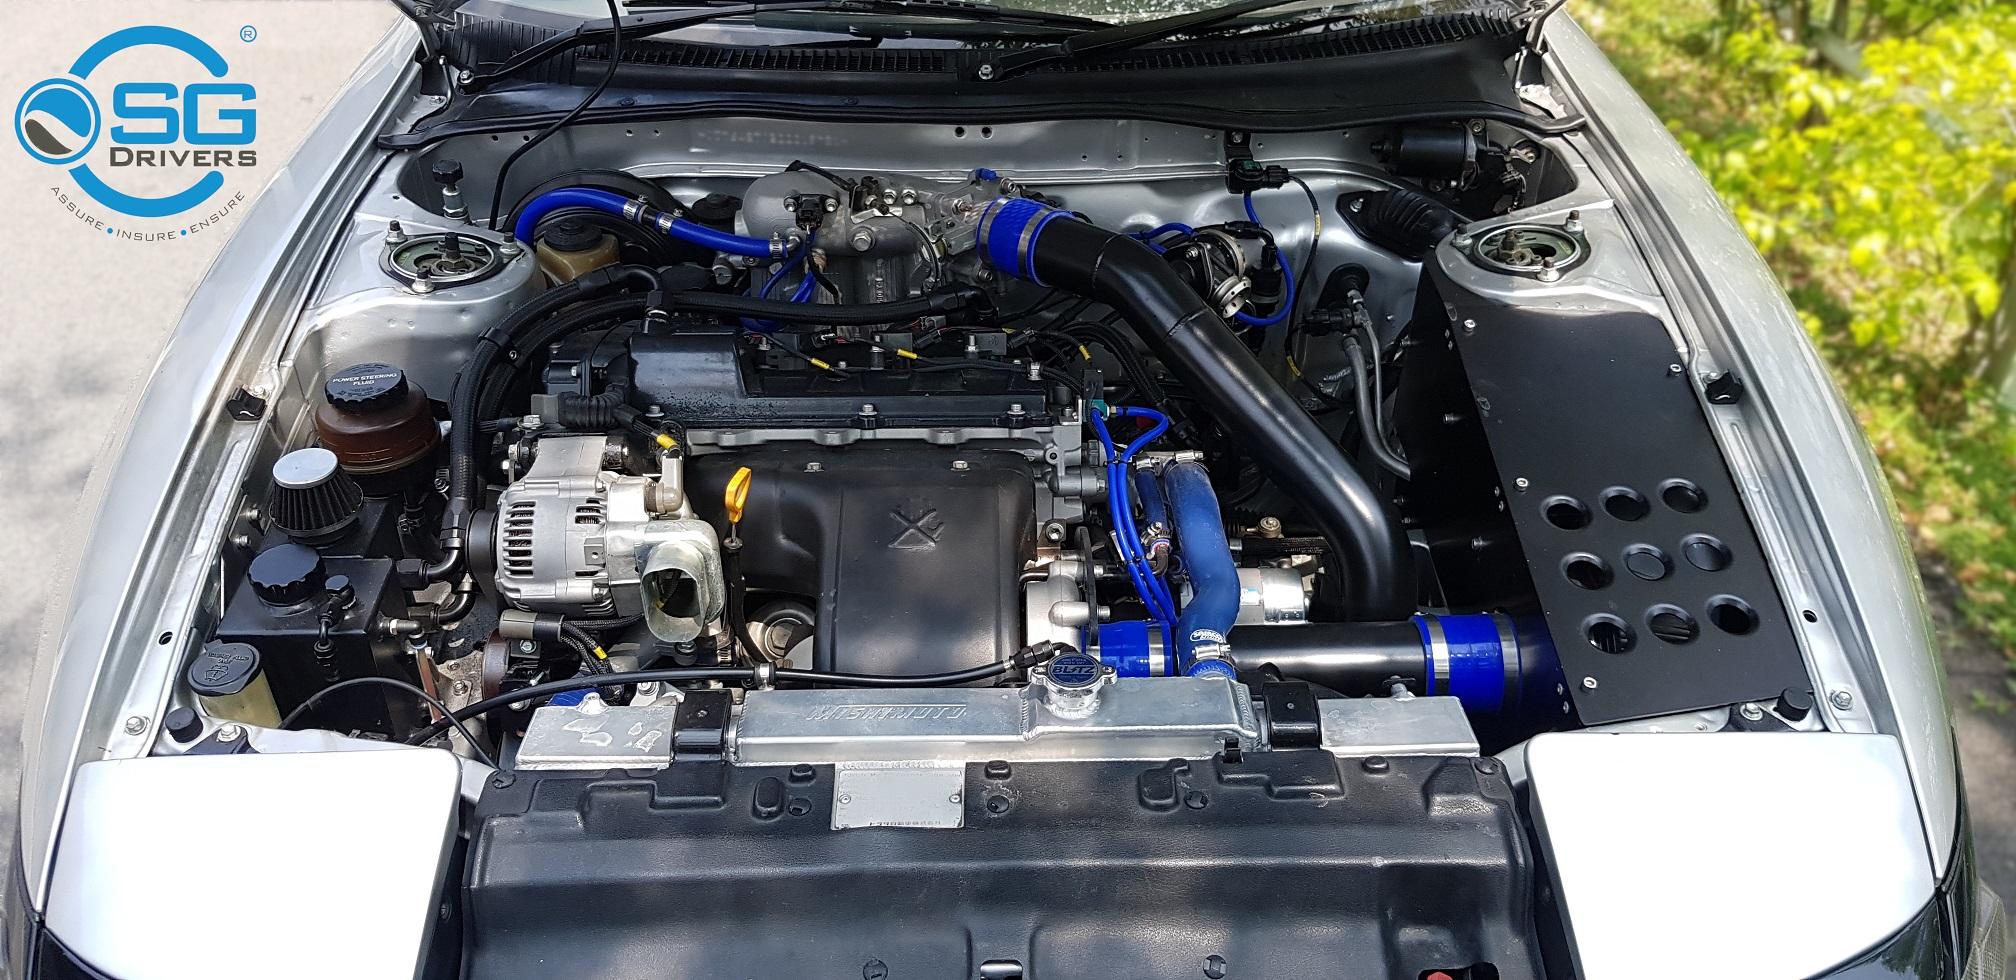 Toyota Celica ST185 Singapore Silver 3sgte engine bay CS edition